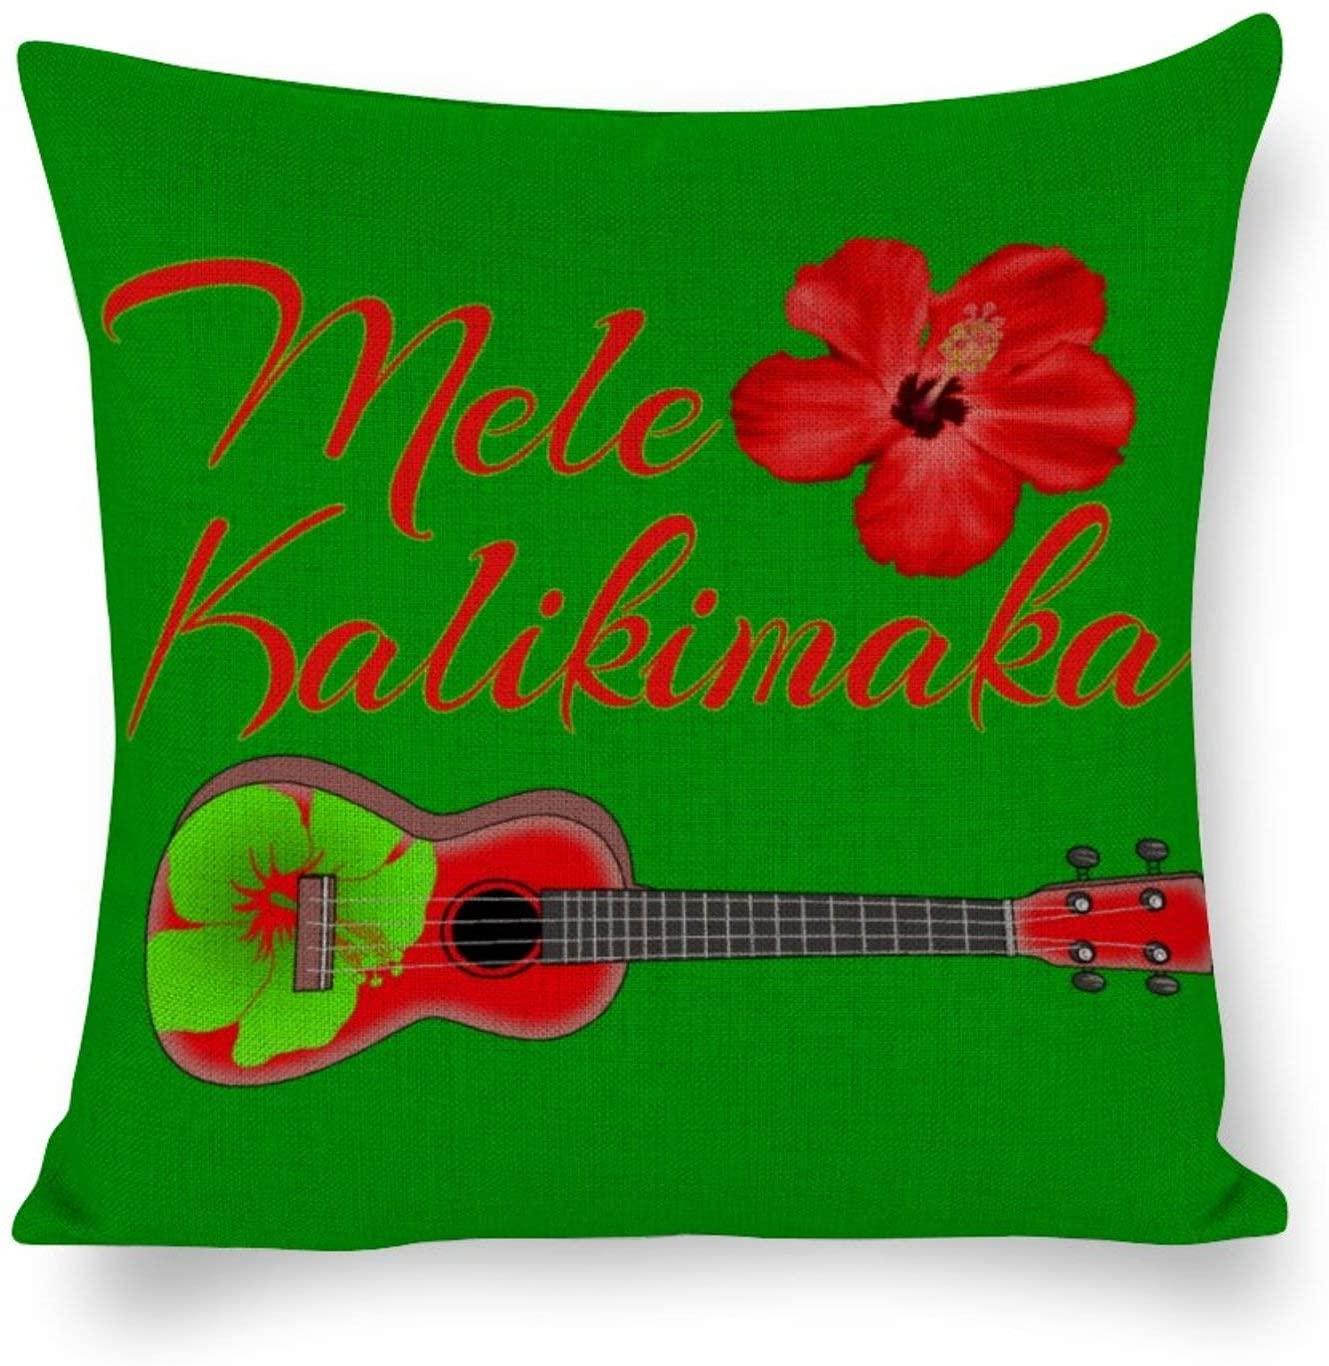 Mele Kalikimaka Ukulele Cotton Linen Blend Throw Pillow Covers Case Cushion Pillowcase with Hidden Zipper Closure for Sofa Bench Bed Home Decor 26x26